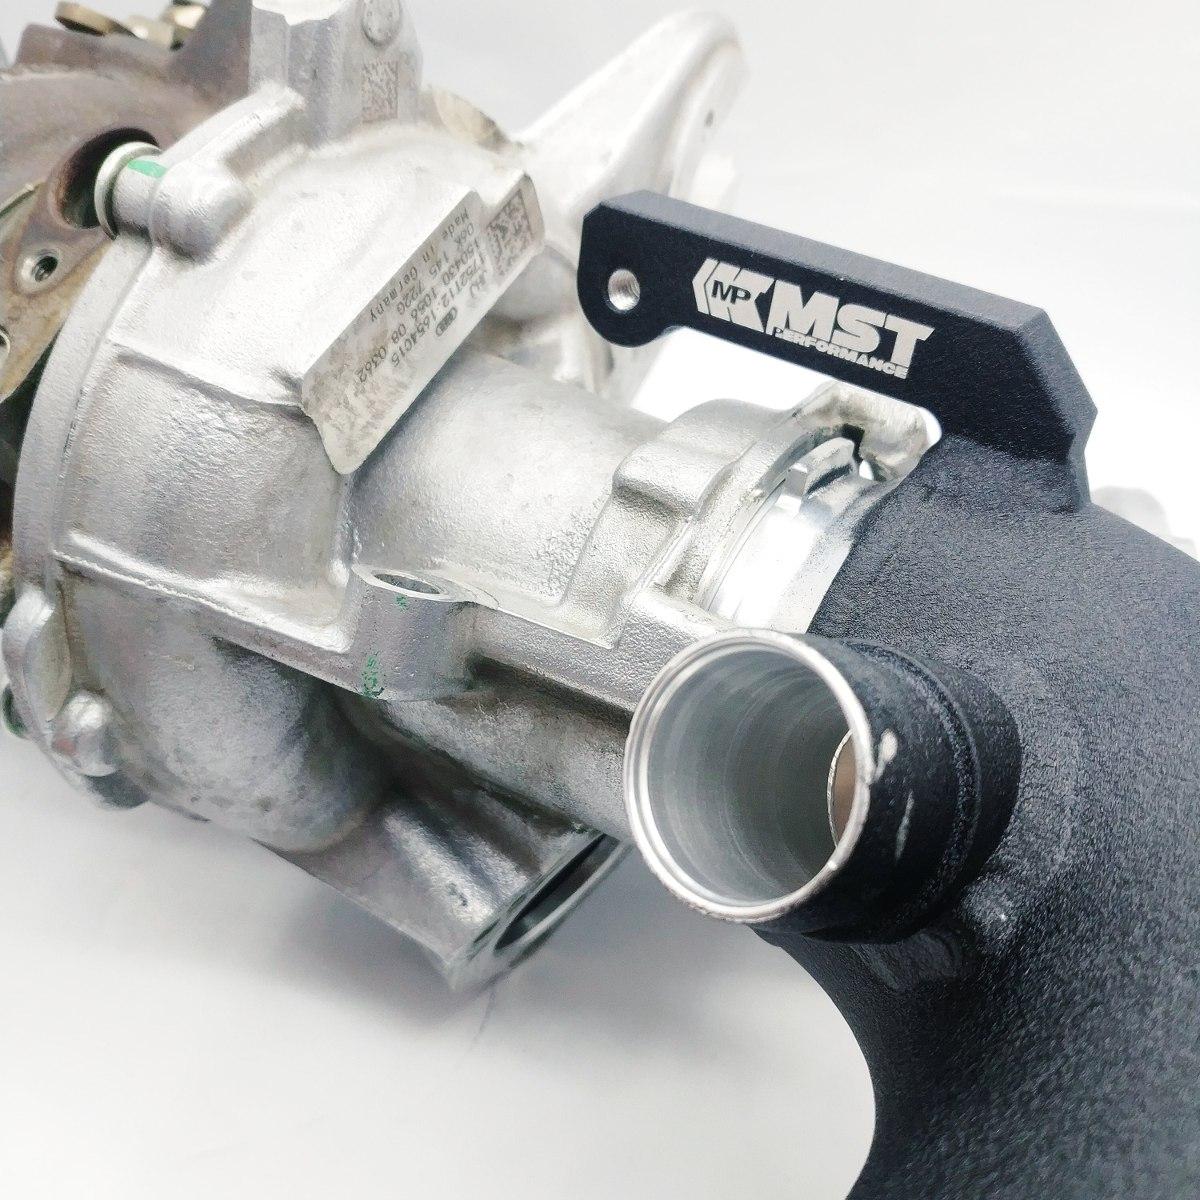 Turbo Inlet Pipe Mqb Cupra Gti Audi S3 Golf R Is12 Is38 Is20